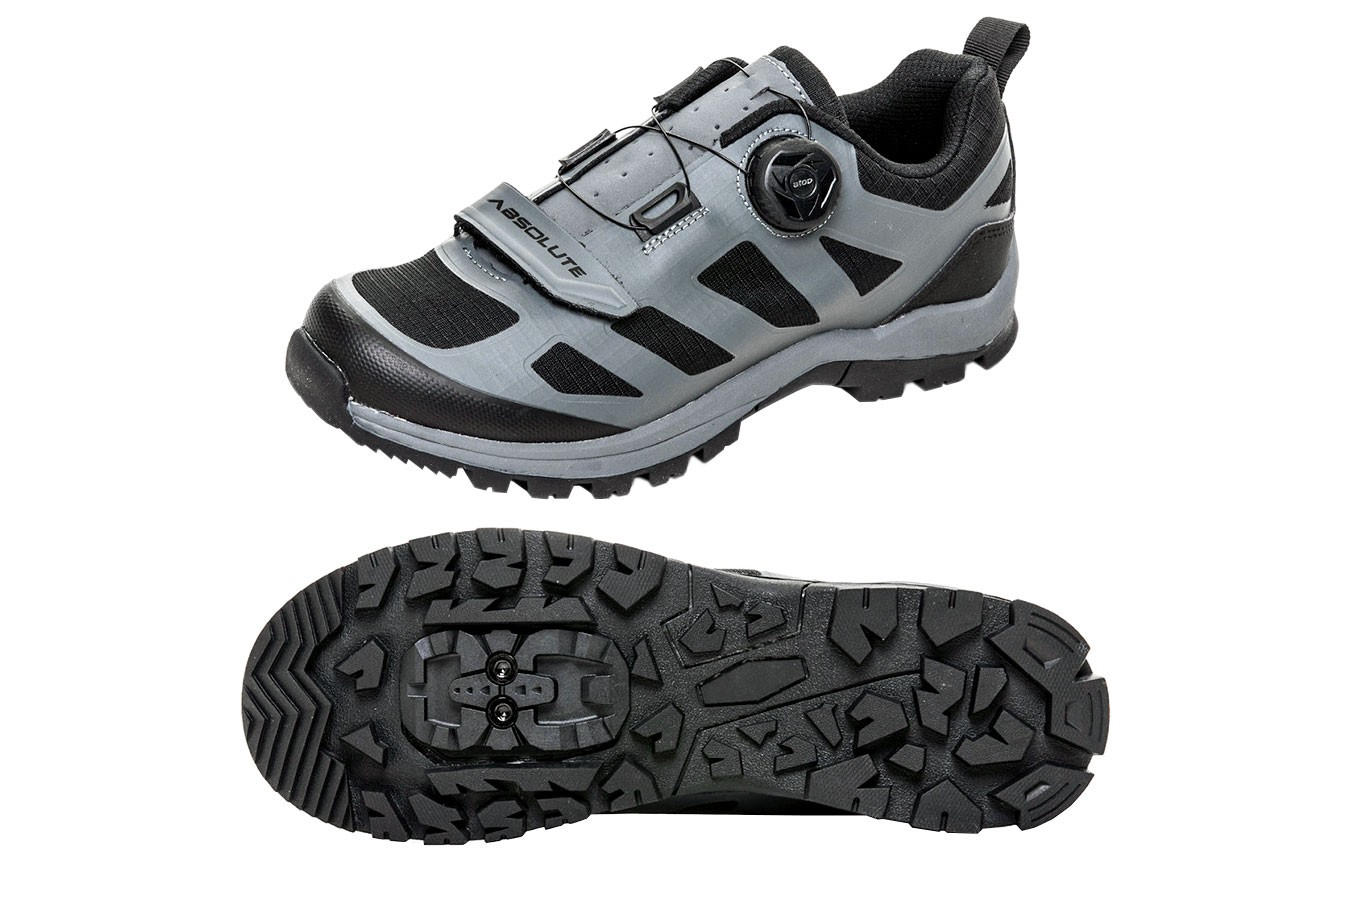 Sapatilha MTB Trail 1 roldana e 1 velcro (tipo tênis) - Absolute